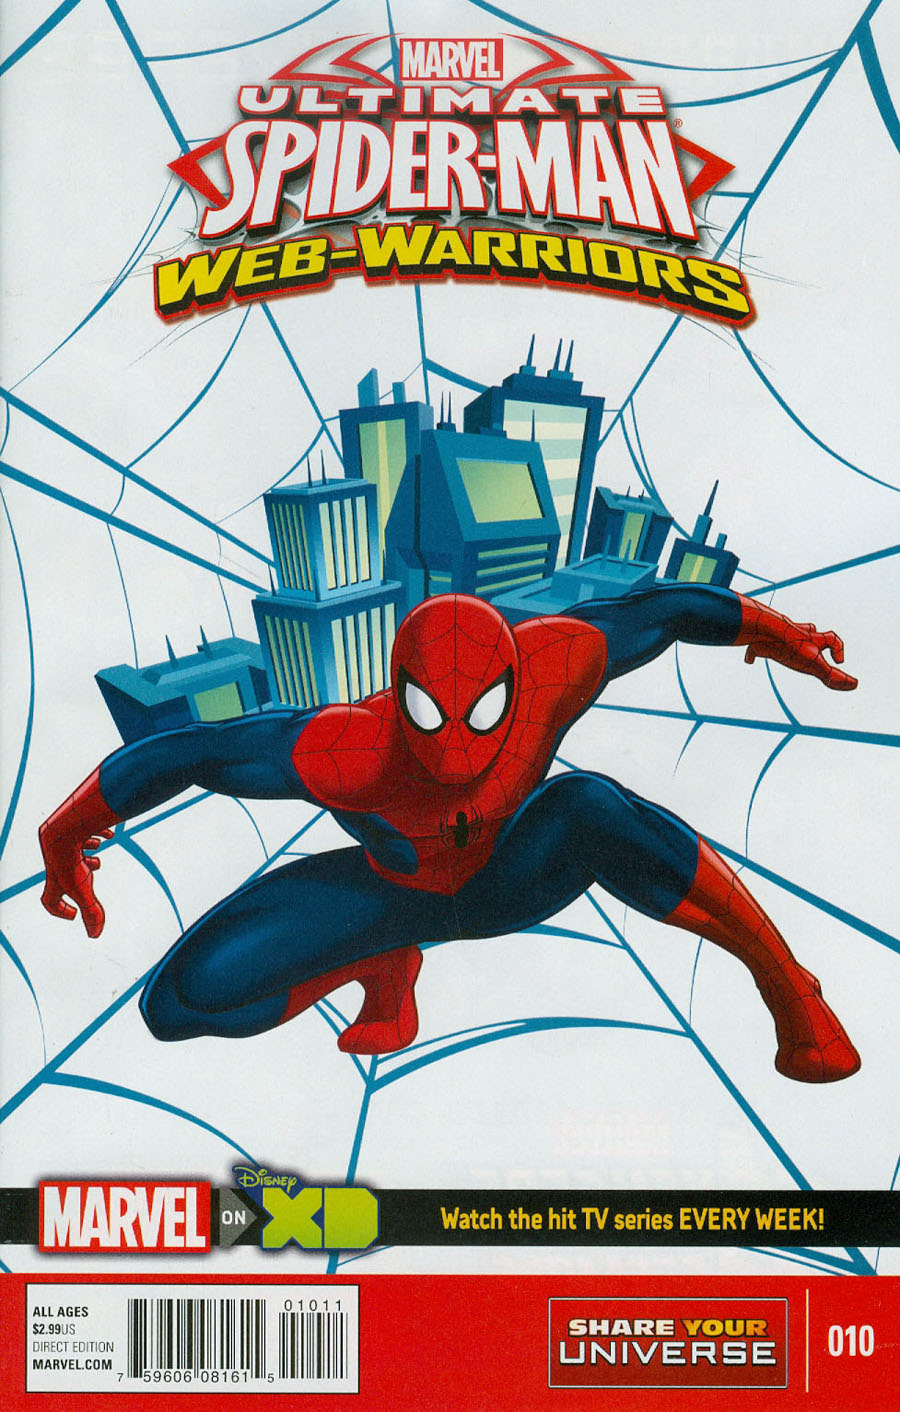 Marvel Universe Ultimate Spider-Man Web Warriors #10